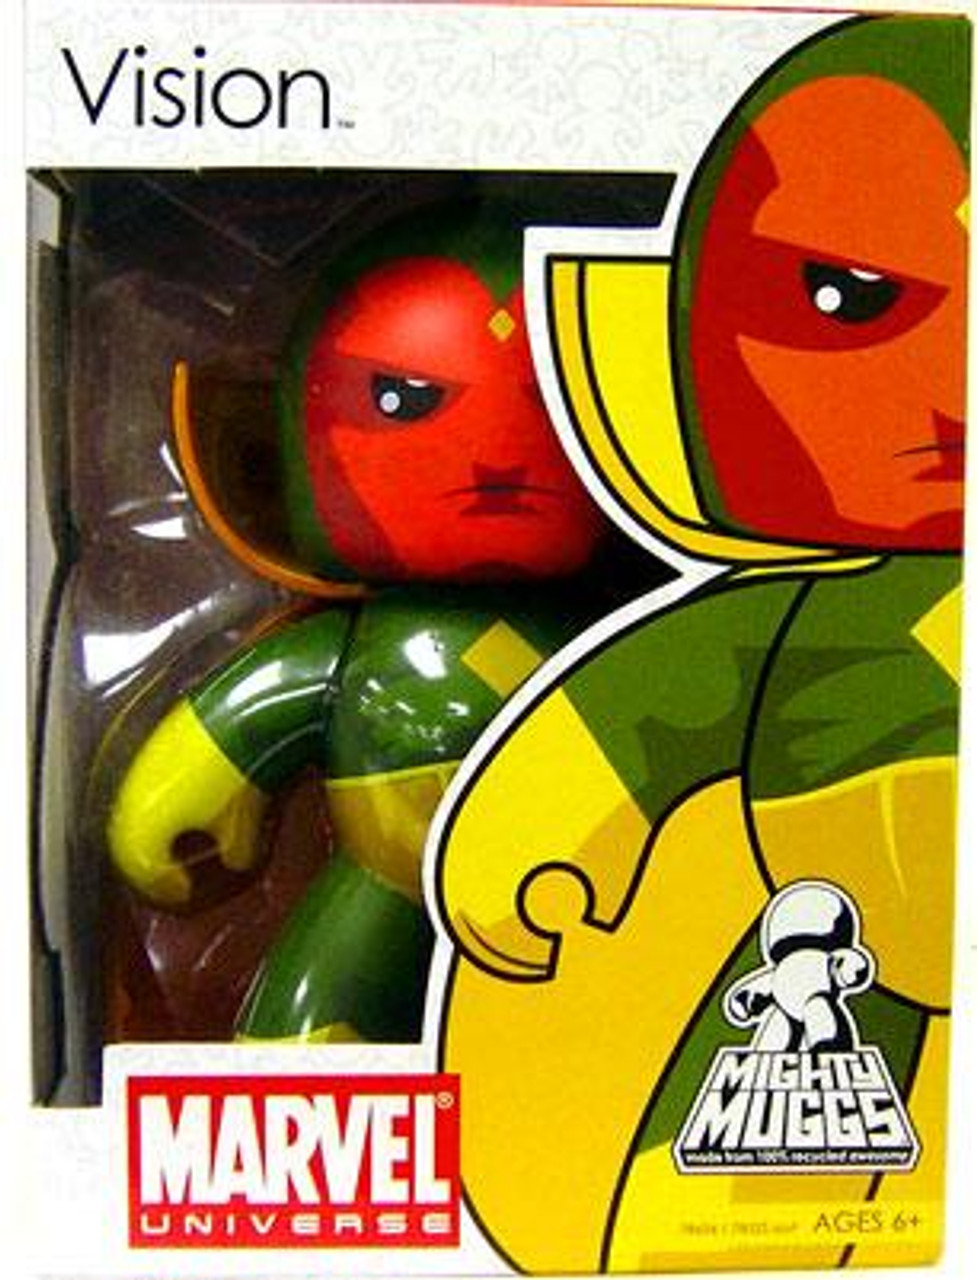 Marvel Mighty Muggs Series 5 Vision Vinyl Figure